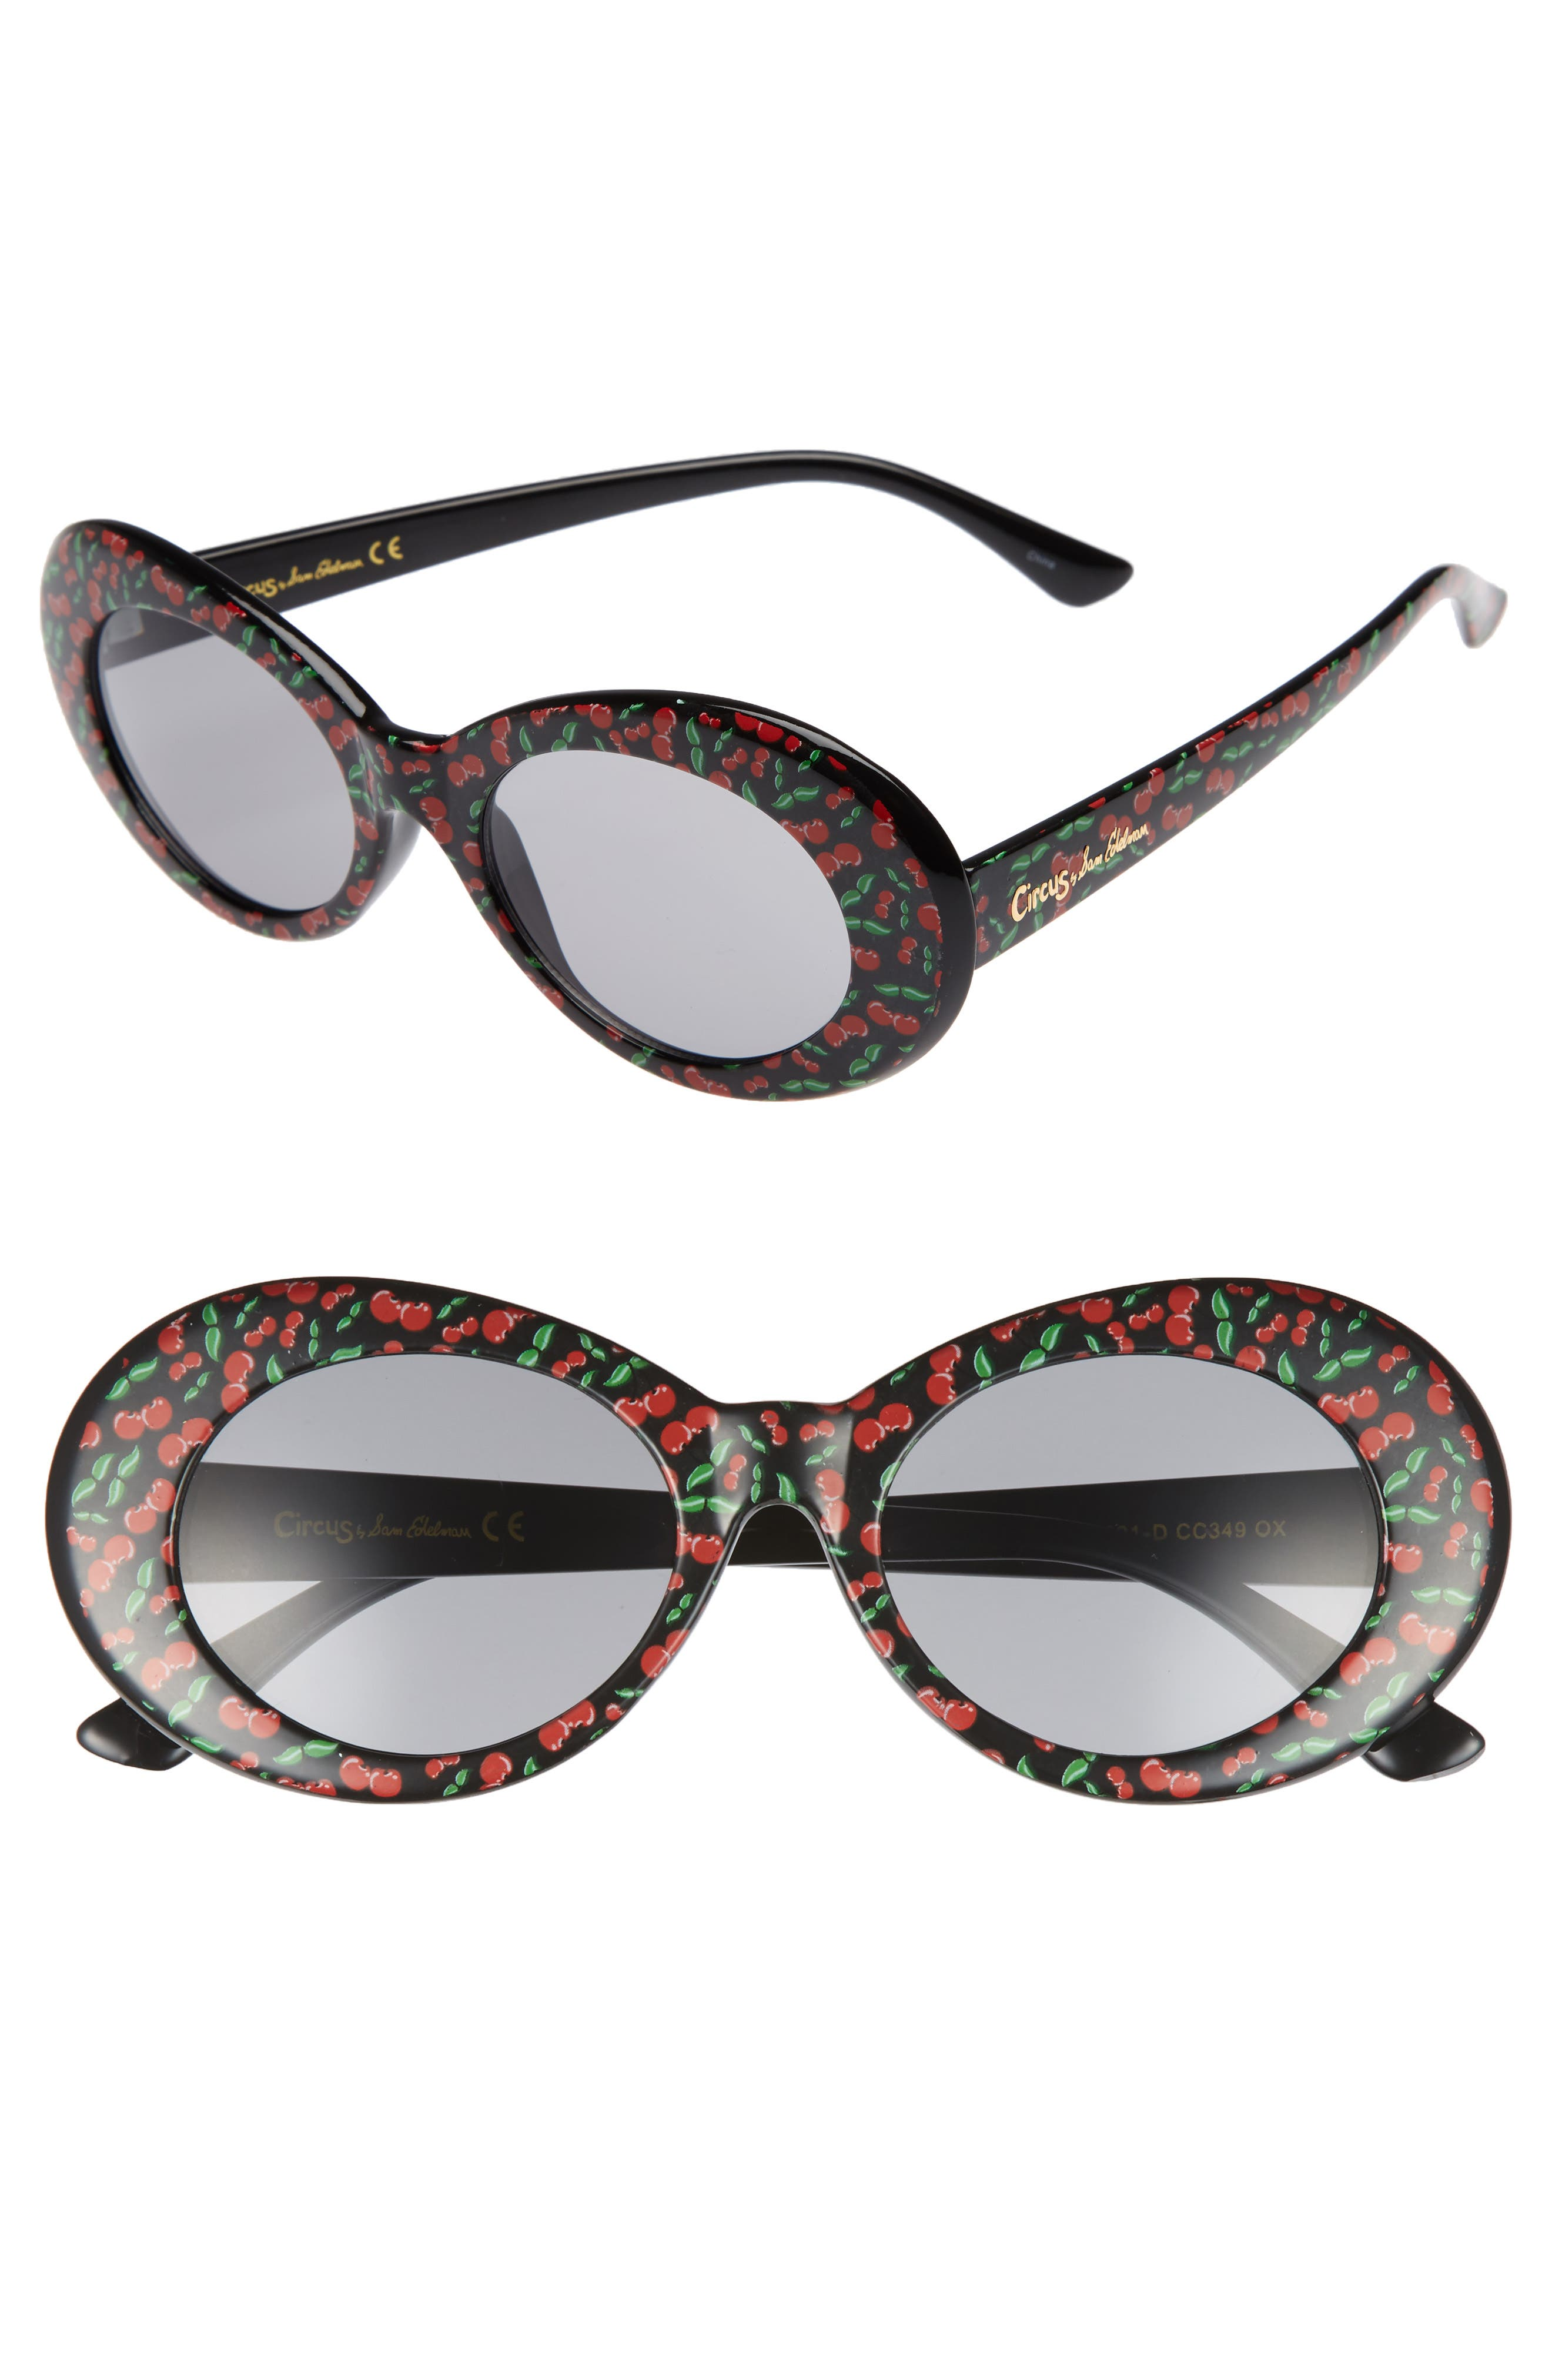 50mm Cherry Print Oval Sunglasses,                             Main thumbnail 1, color,                             Black/ Cherry Print